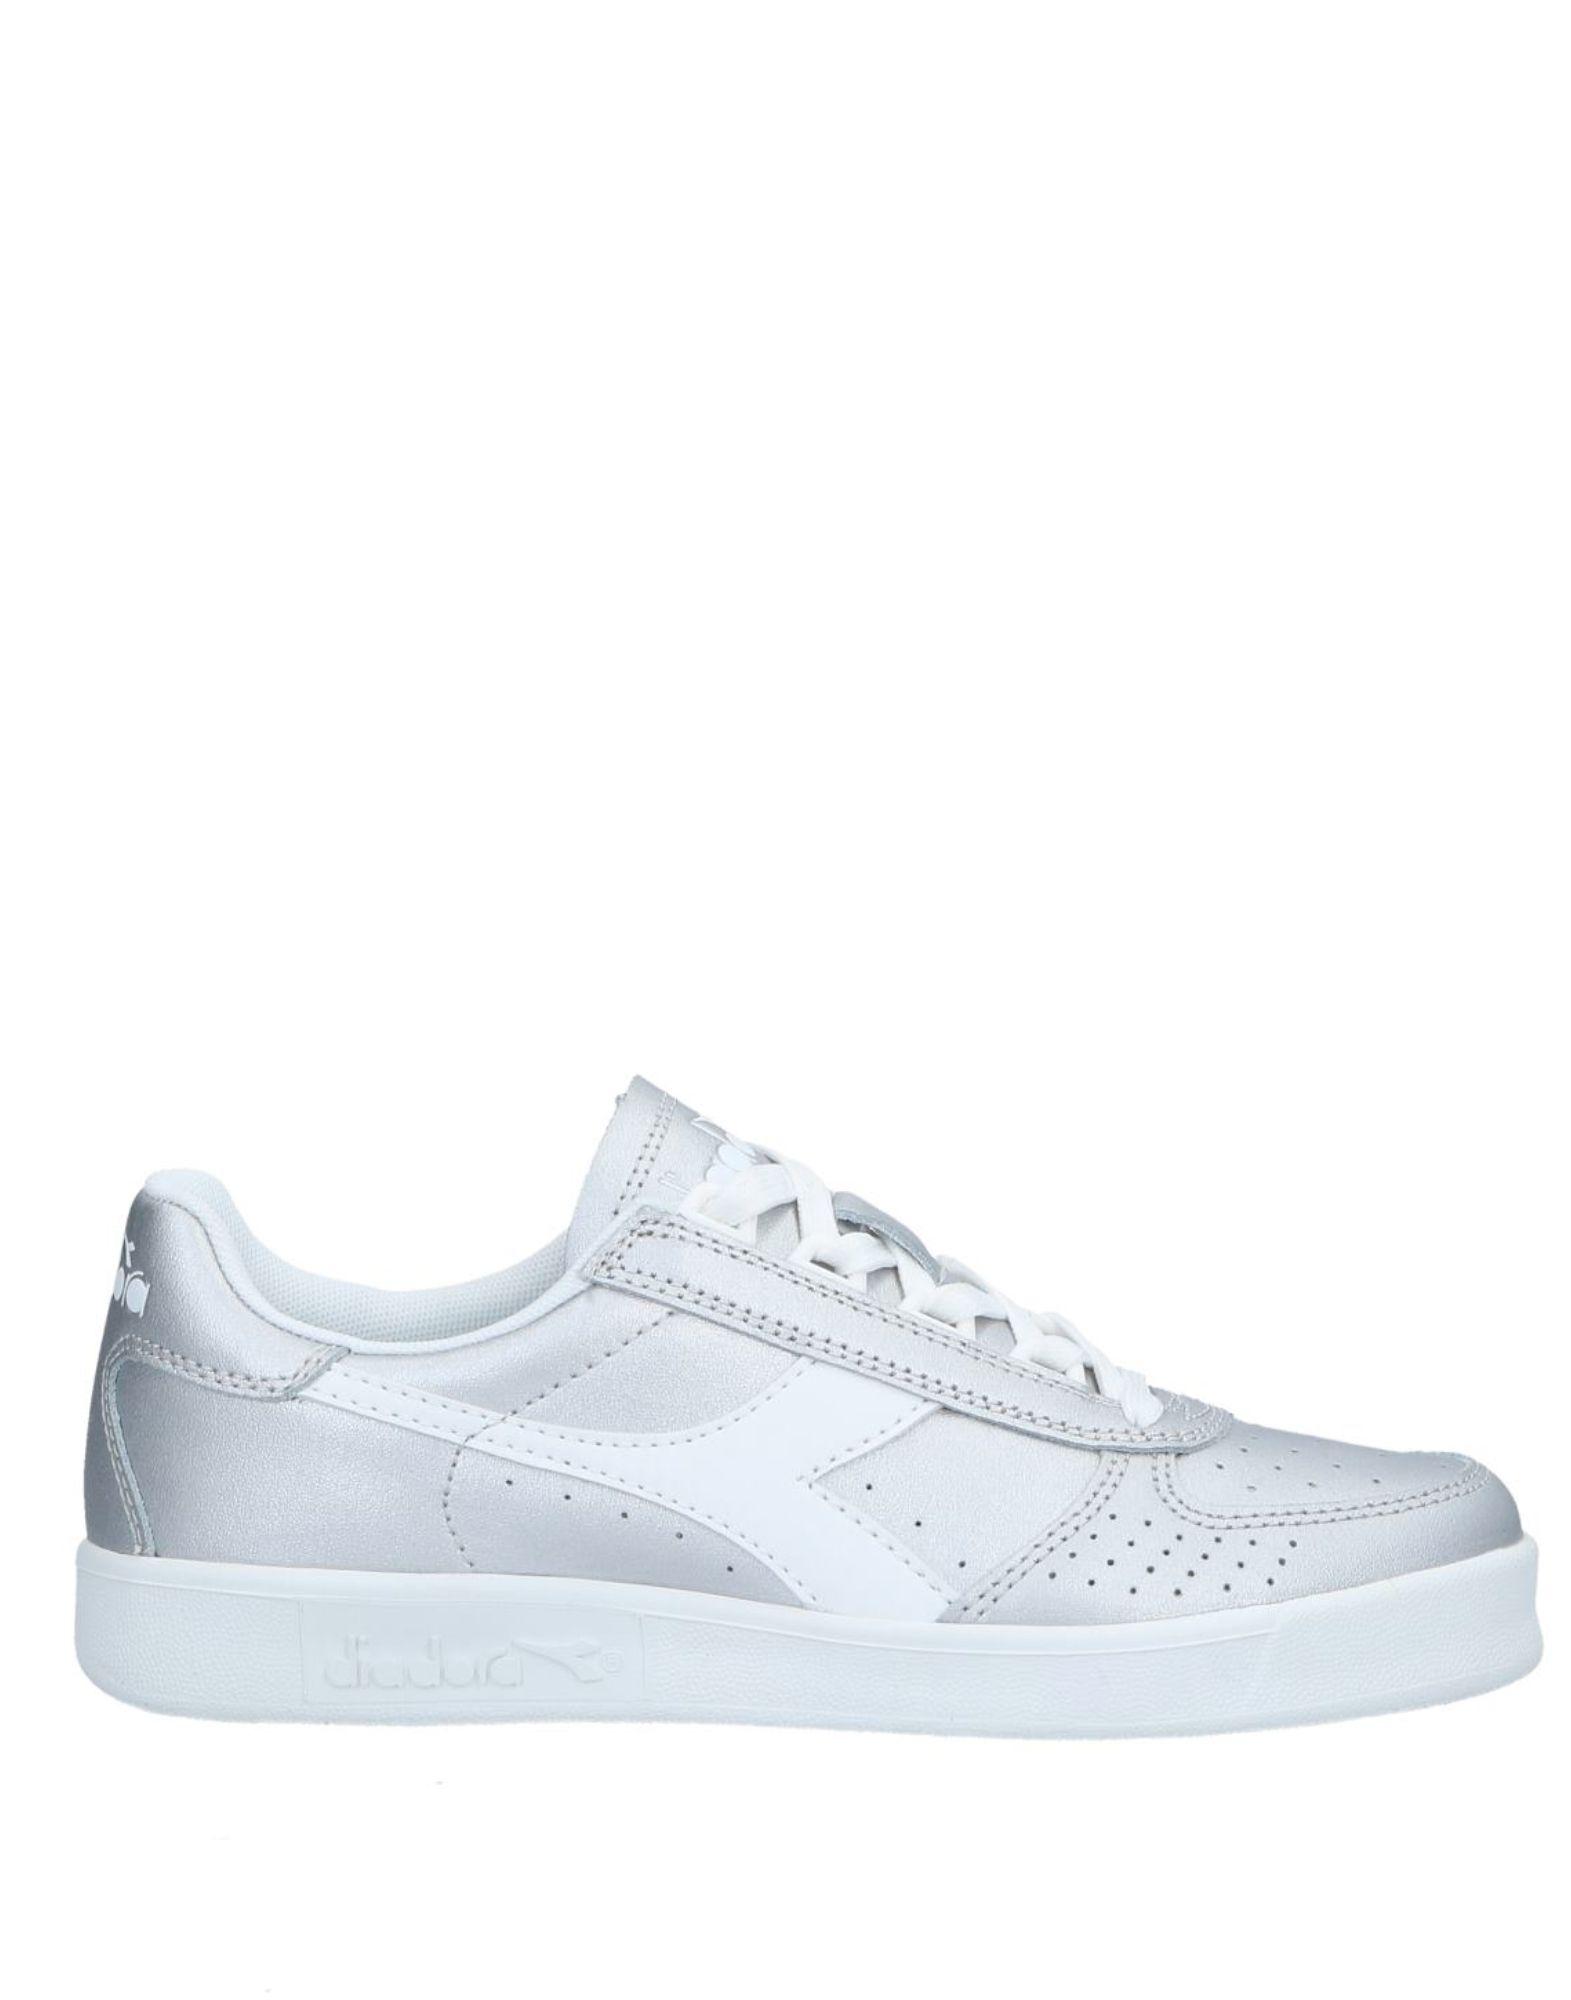 Diadora Sneakers - Women Diadora Sneakers Kingdom online on  United Kingdom Sneakers - 11544060RO 0383f3